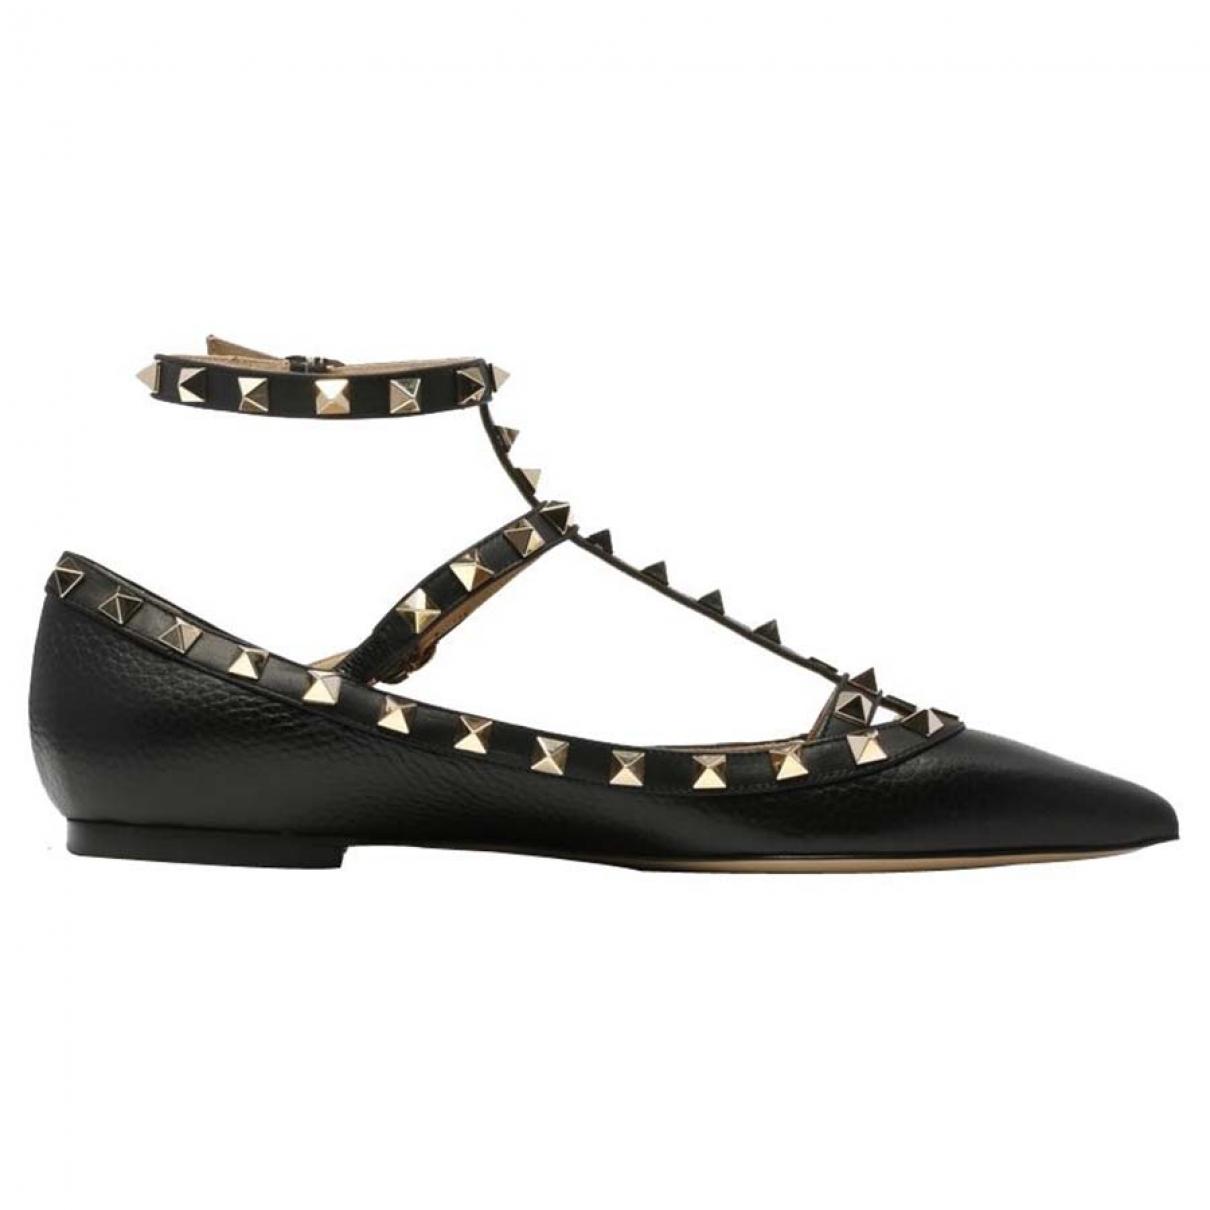 Valentino Garavani \N Black Leather Ballet flats for Women 36.5 EU